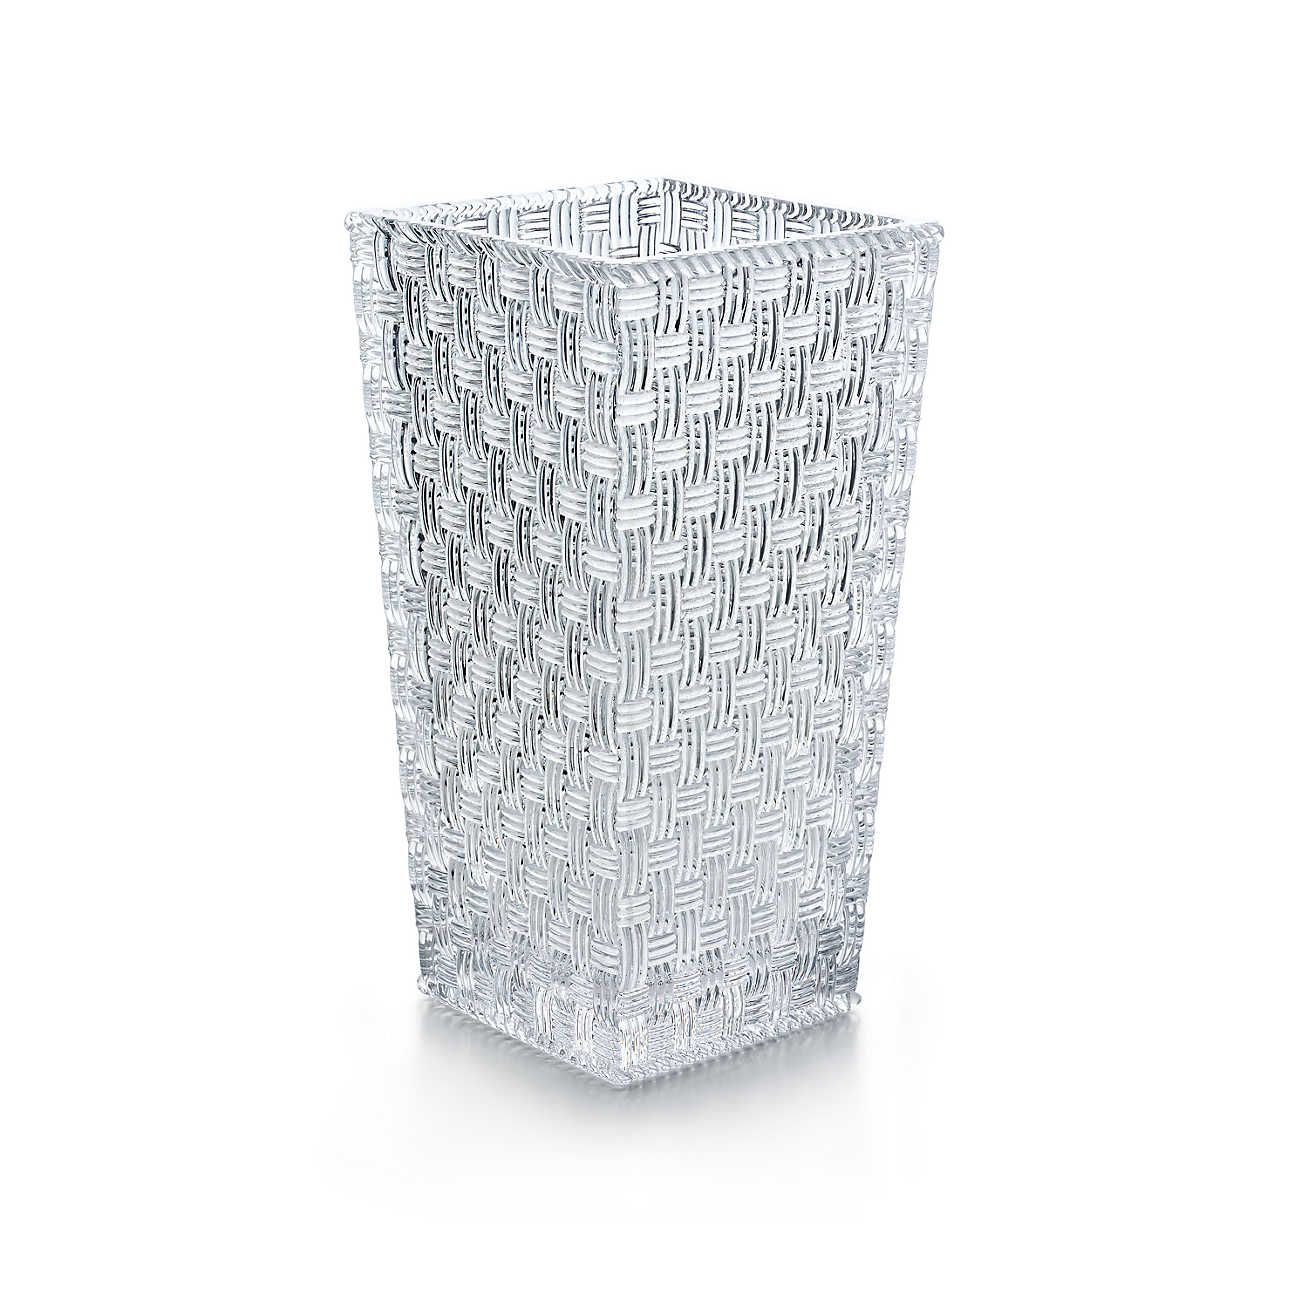 Woventrumpet vase housewares pinterest trumpets woventrumpet vase reviewsmspy